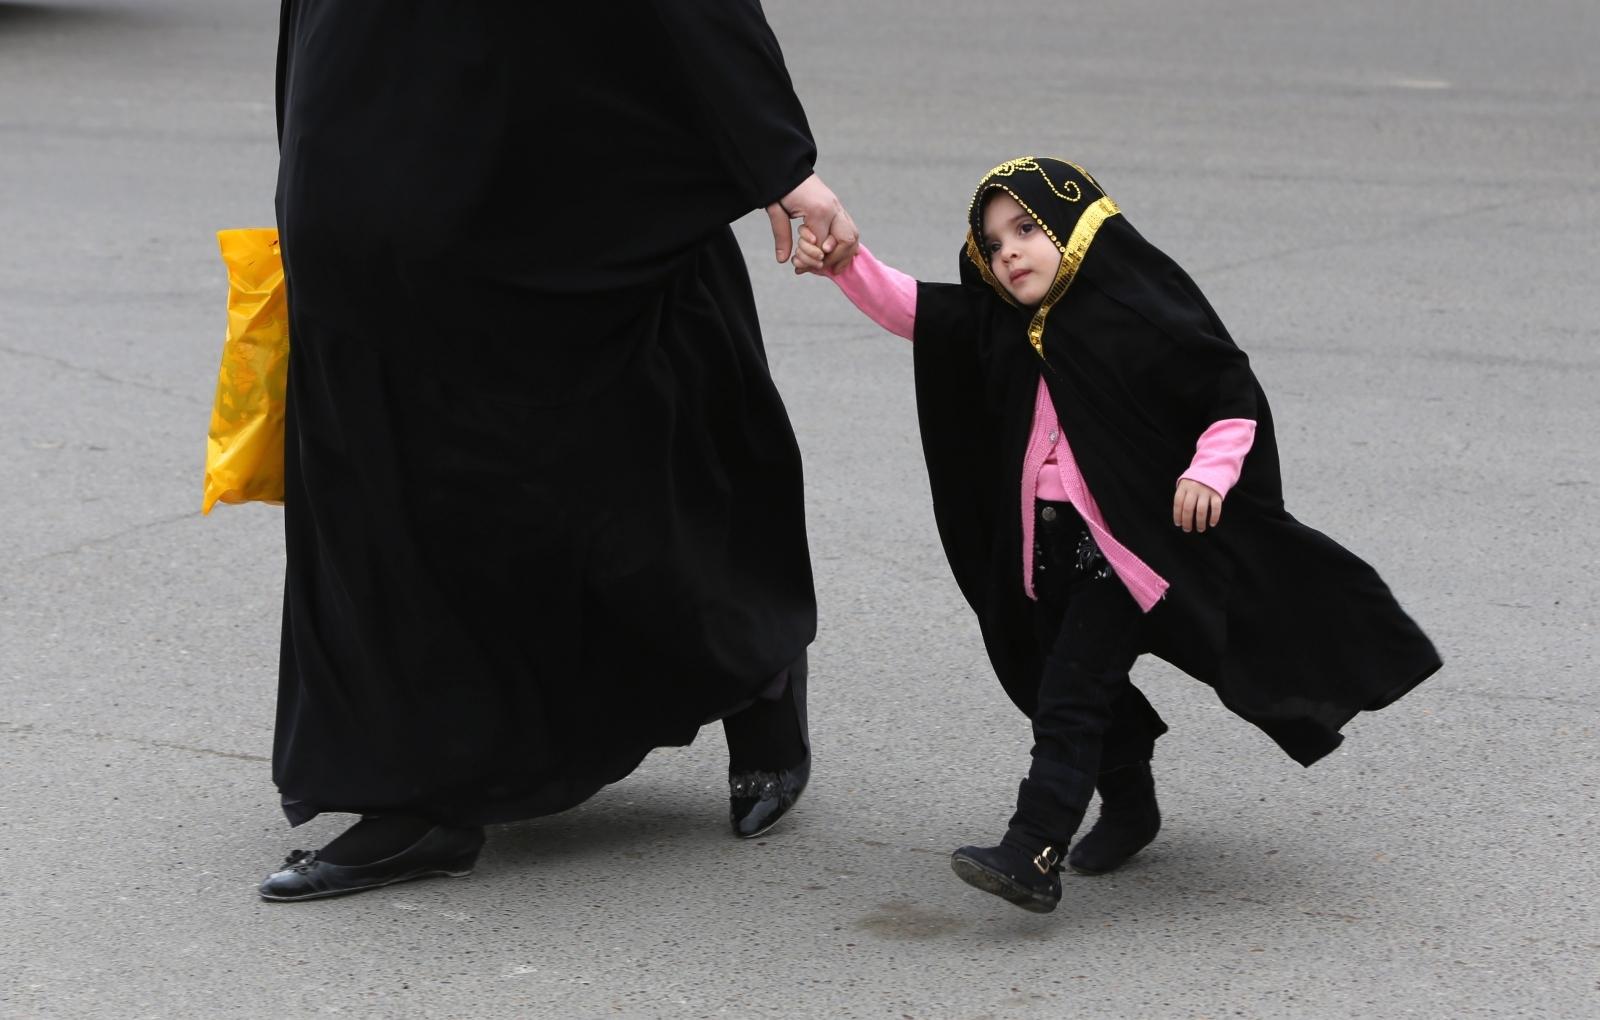 Iraq child marriage